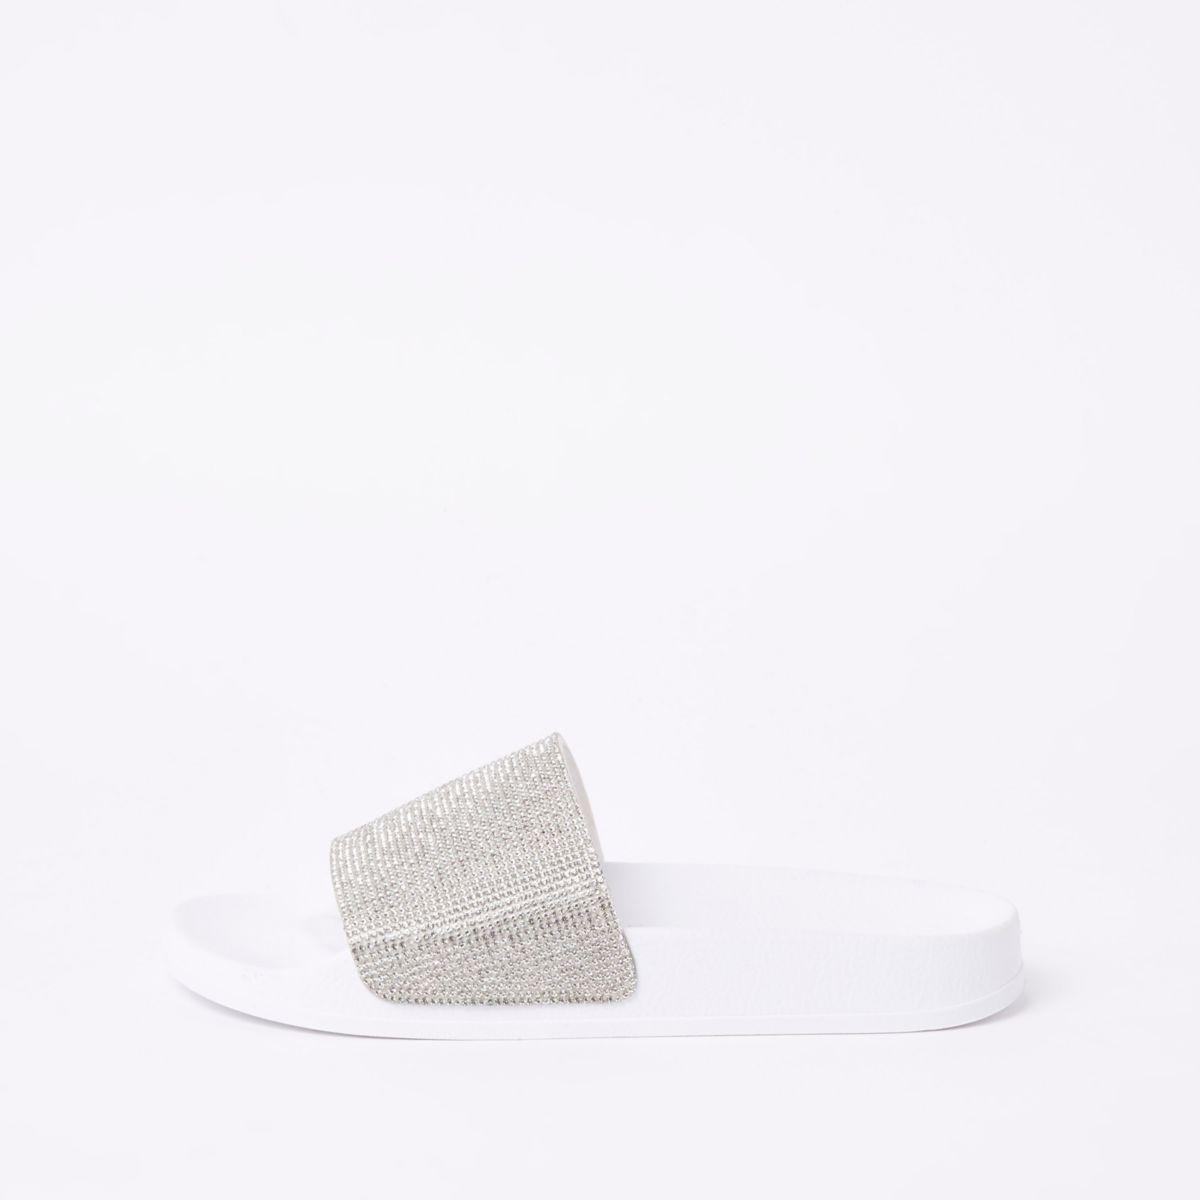 Witte slippers met siersteentjes